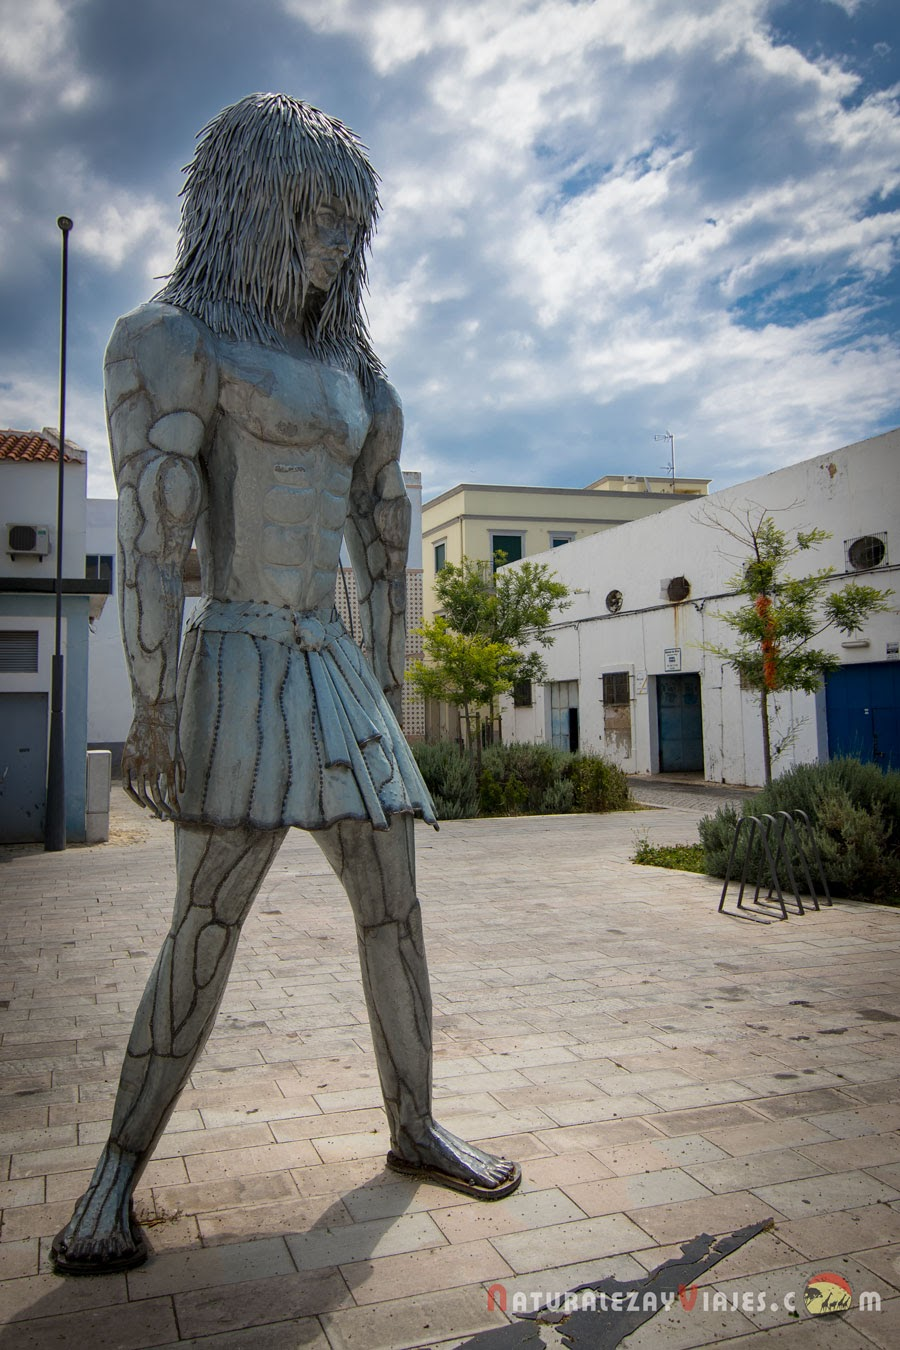 Arraul, Olhão, Algarve